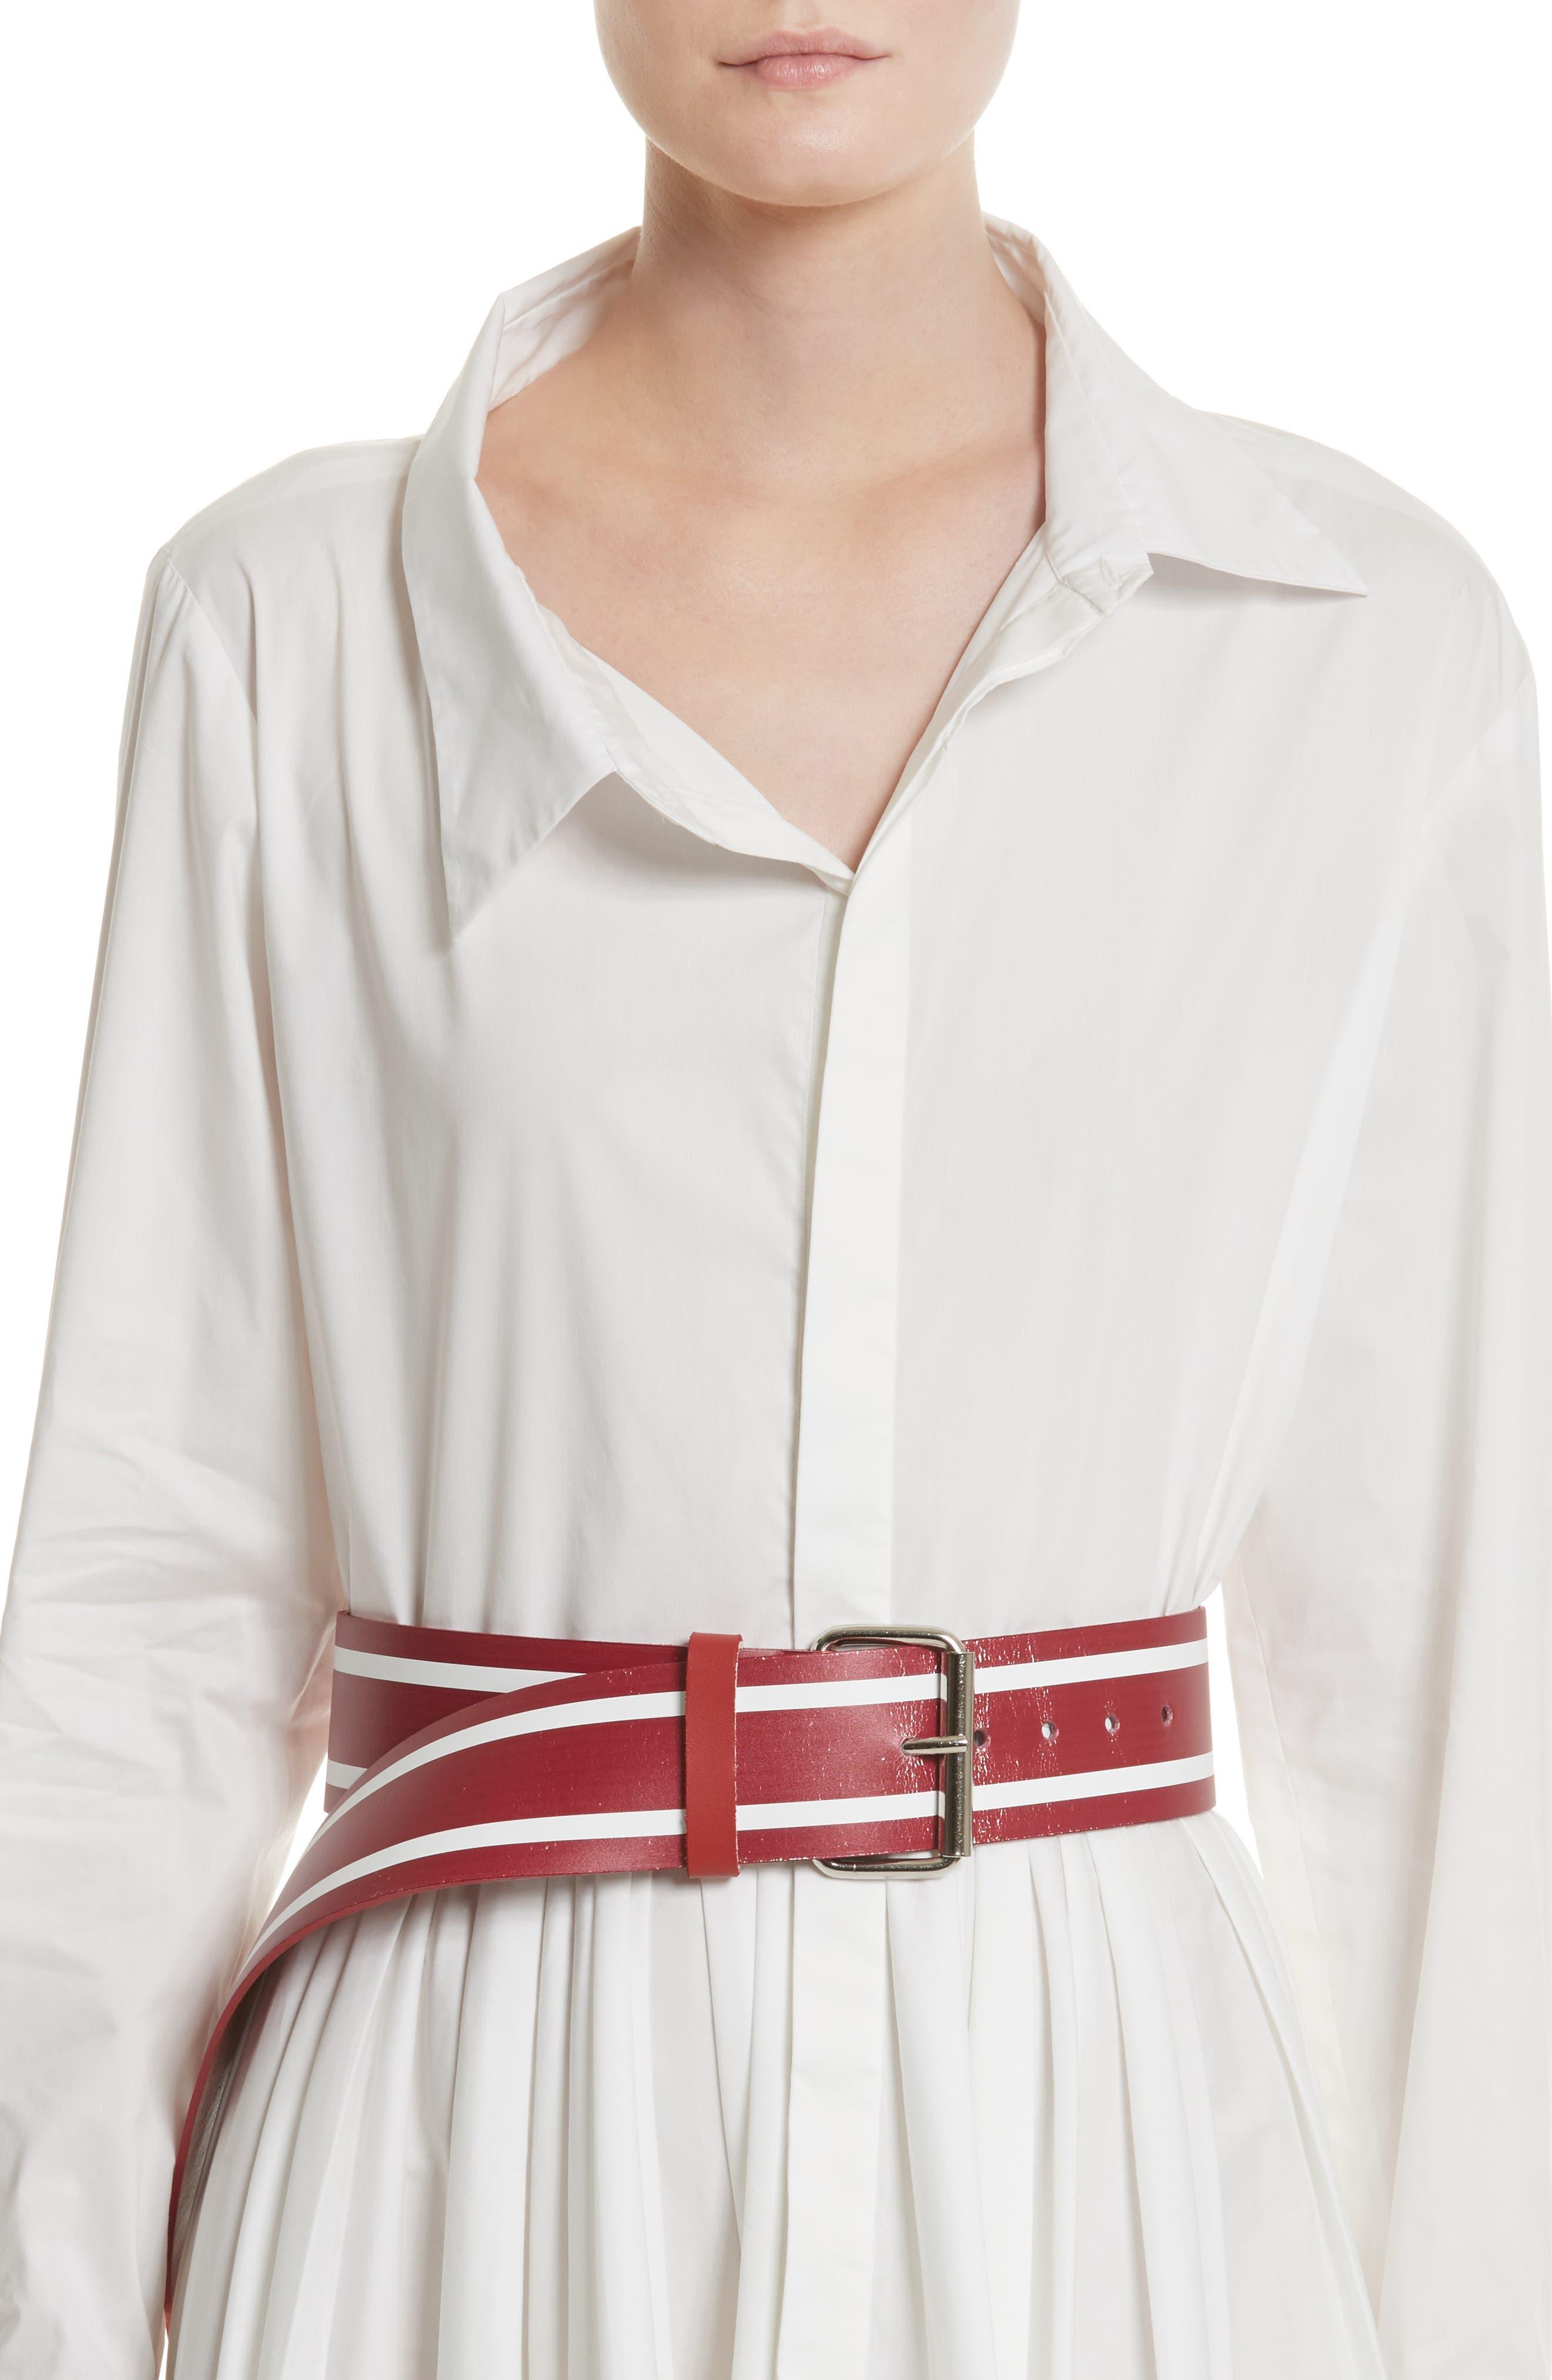 Racing Stripe Leather Belt,                             Alternate thumbnail 2, color,                             600